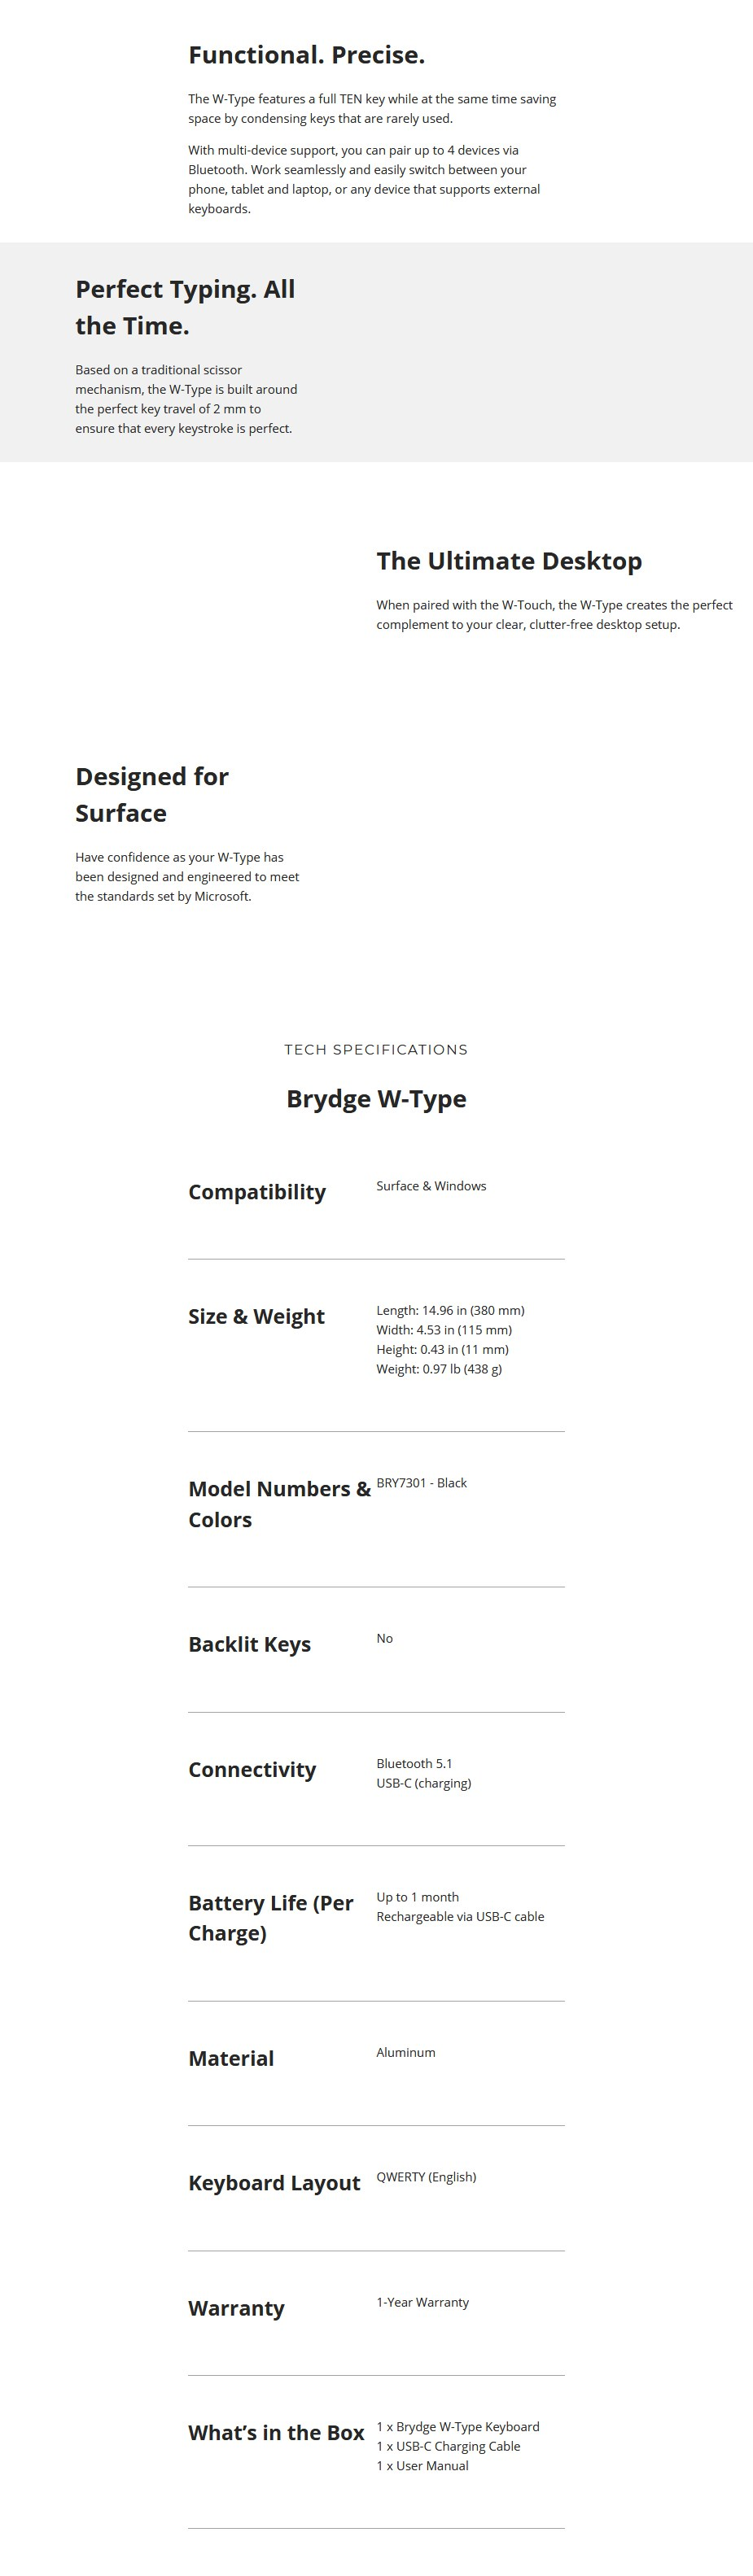 Brydge W-Type Bluetooth Wireless Keyboard For Windows - Black - Overview 1